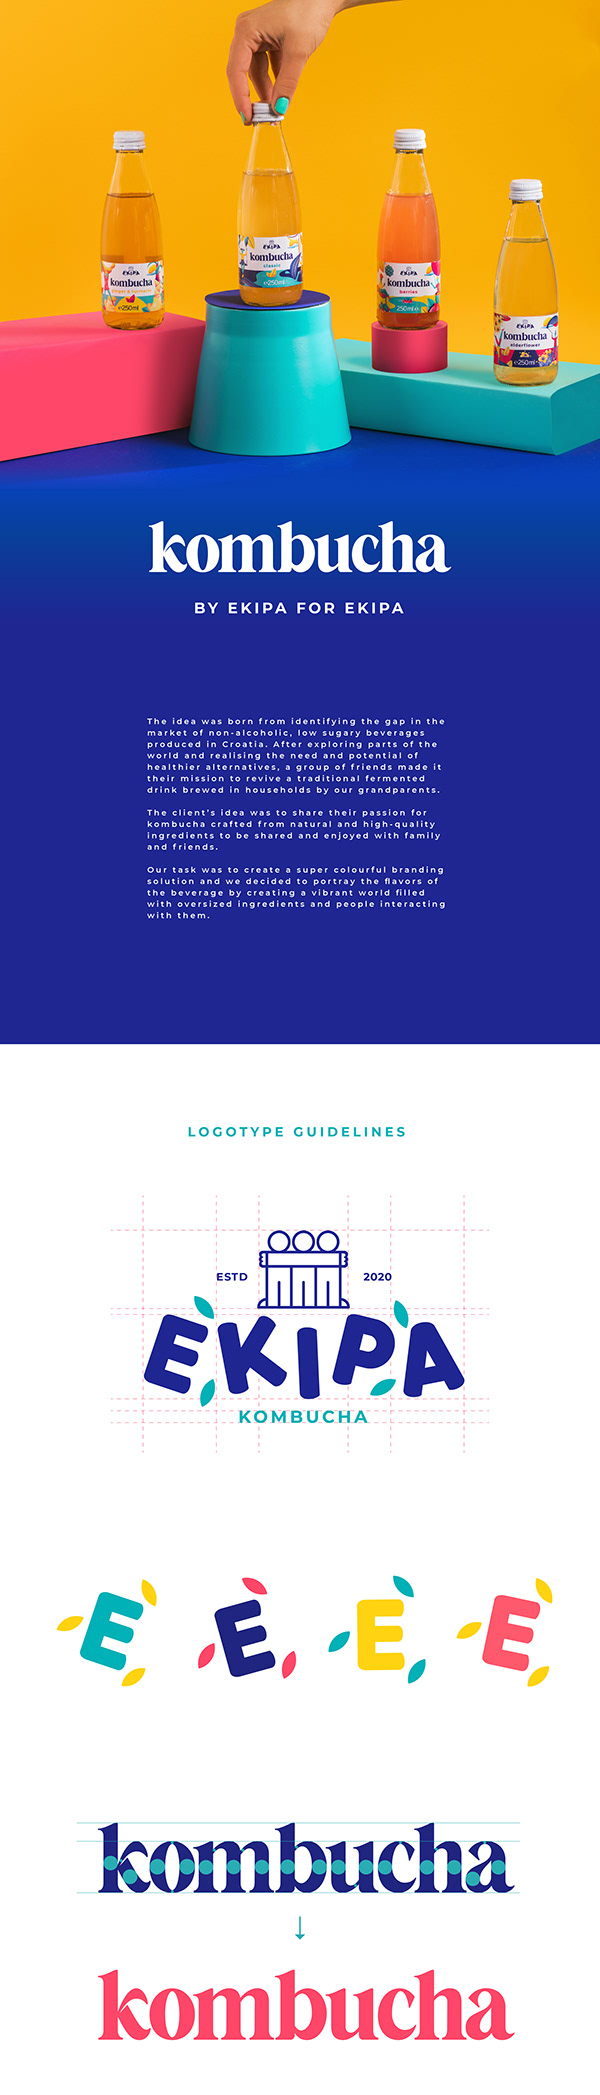 Ekipa - Kombucha Packaging